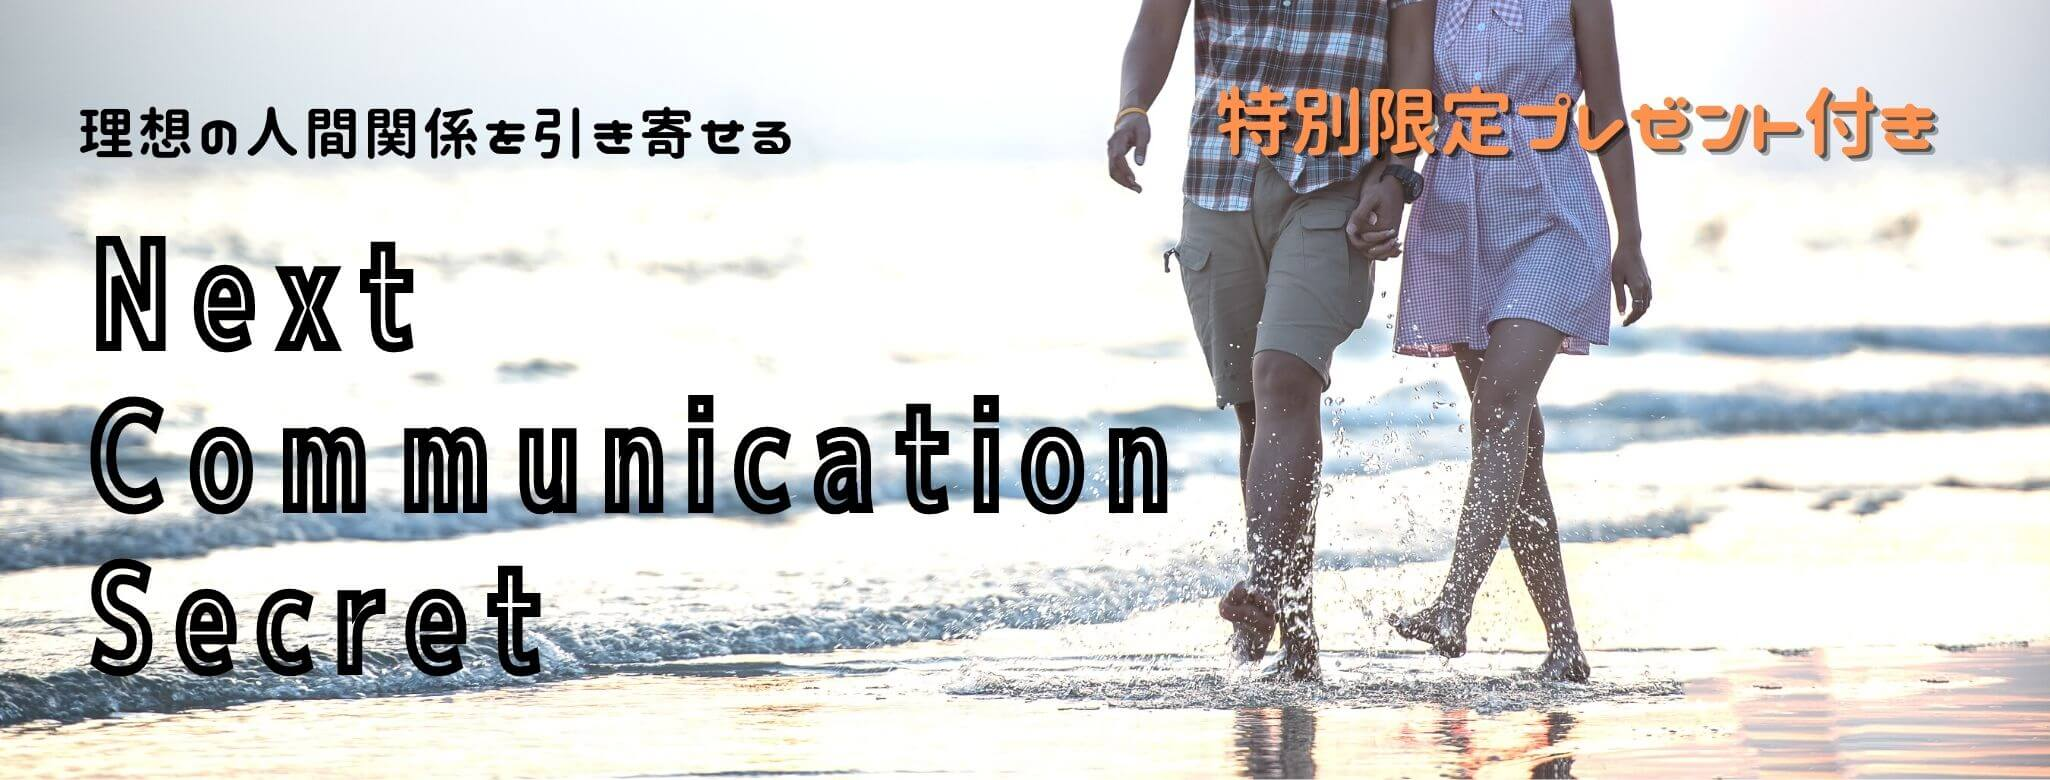 NextCommunicationSecret ネクストコミュニケーションシークレット